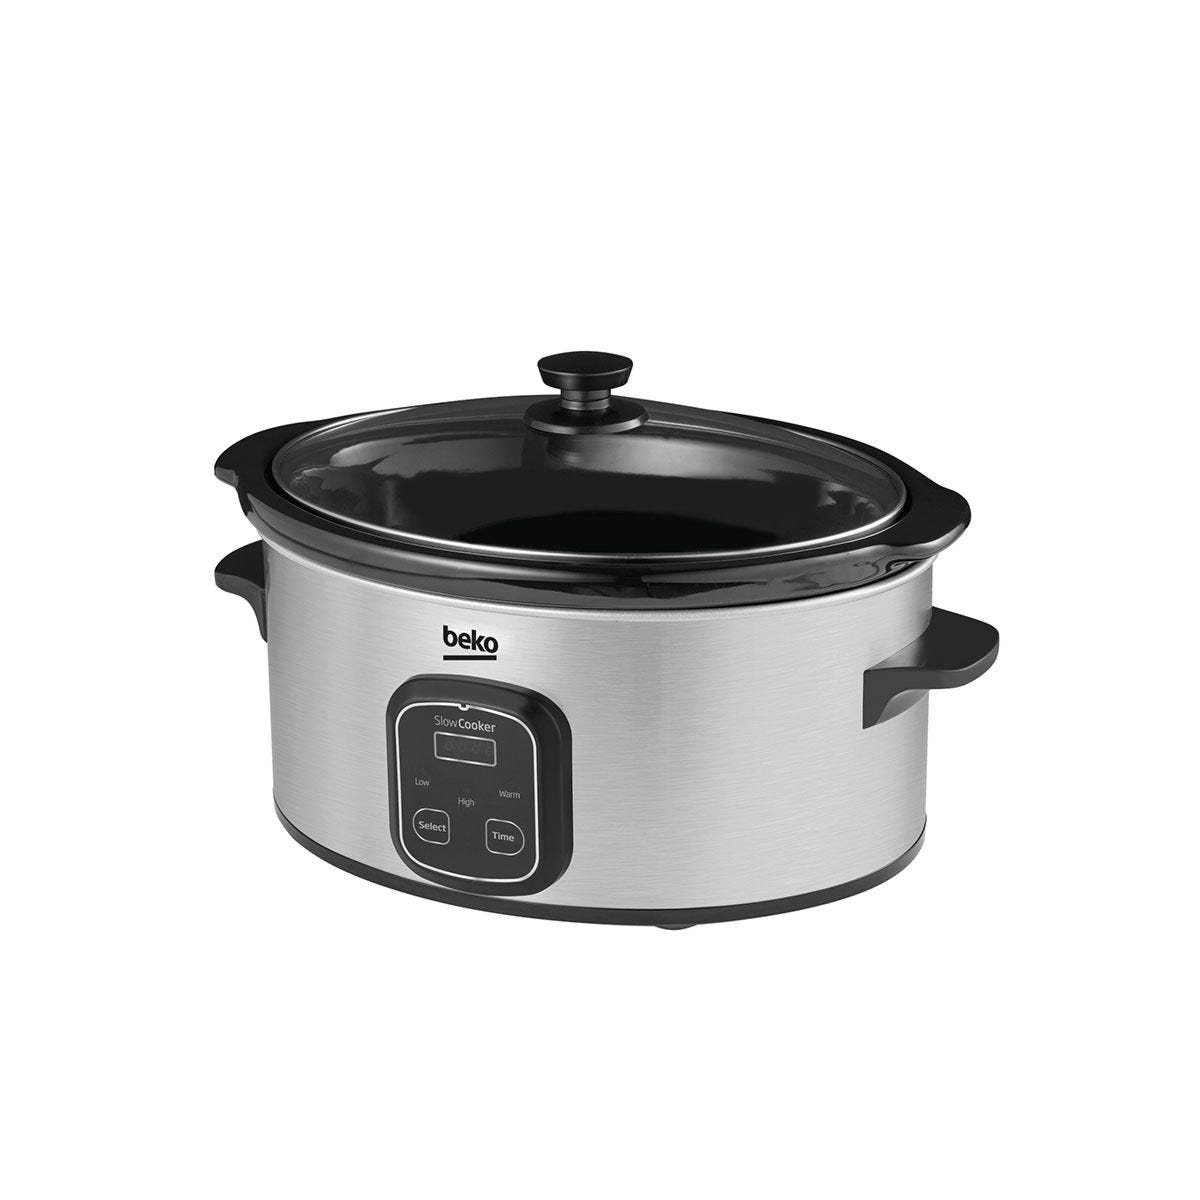 Beko SCM3622X 6L Stainless Steel Slow Cooker - Silver